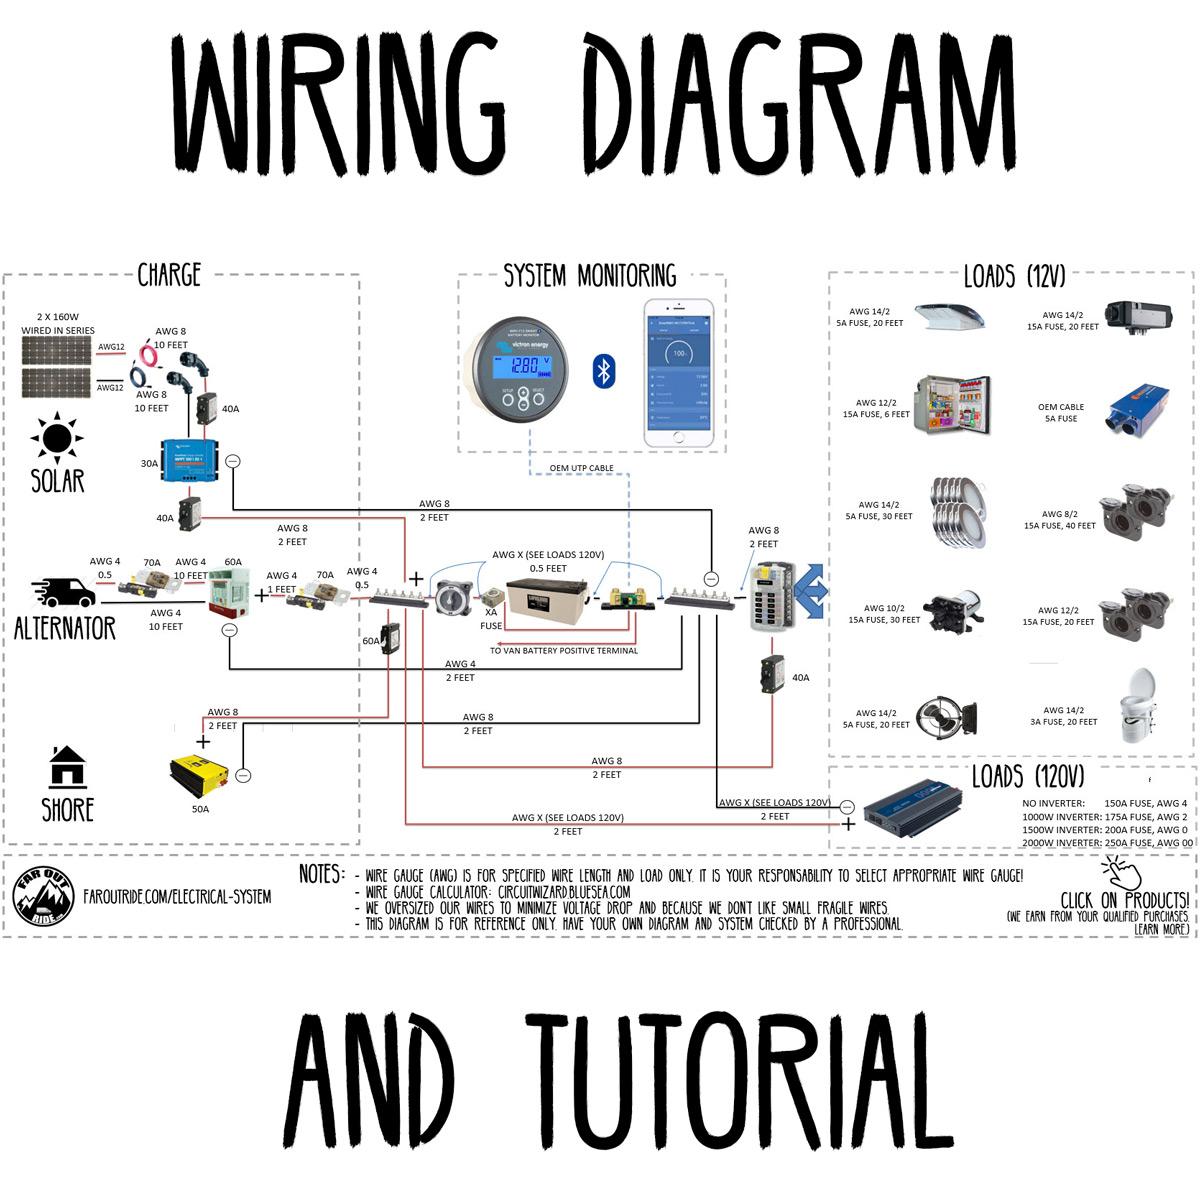 Wiring Diagram & Tutorial | FarOutRide